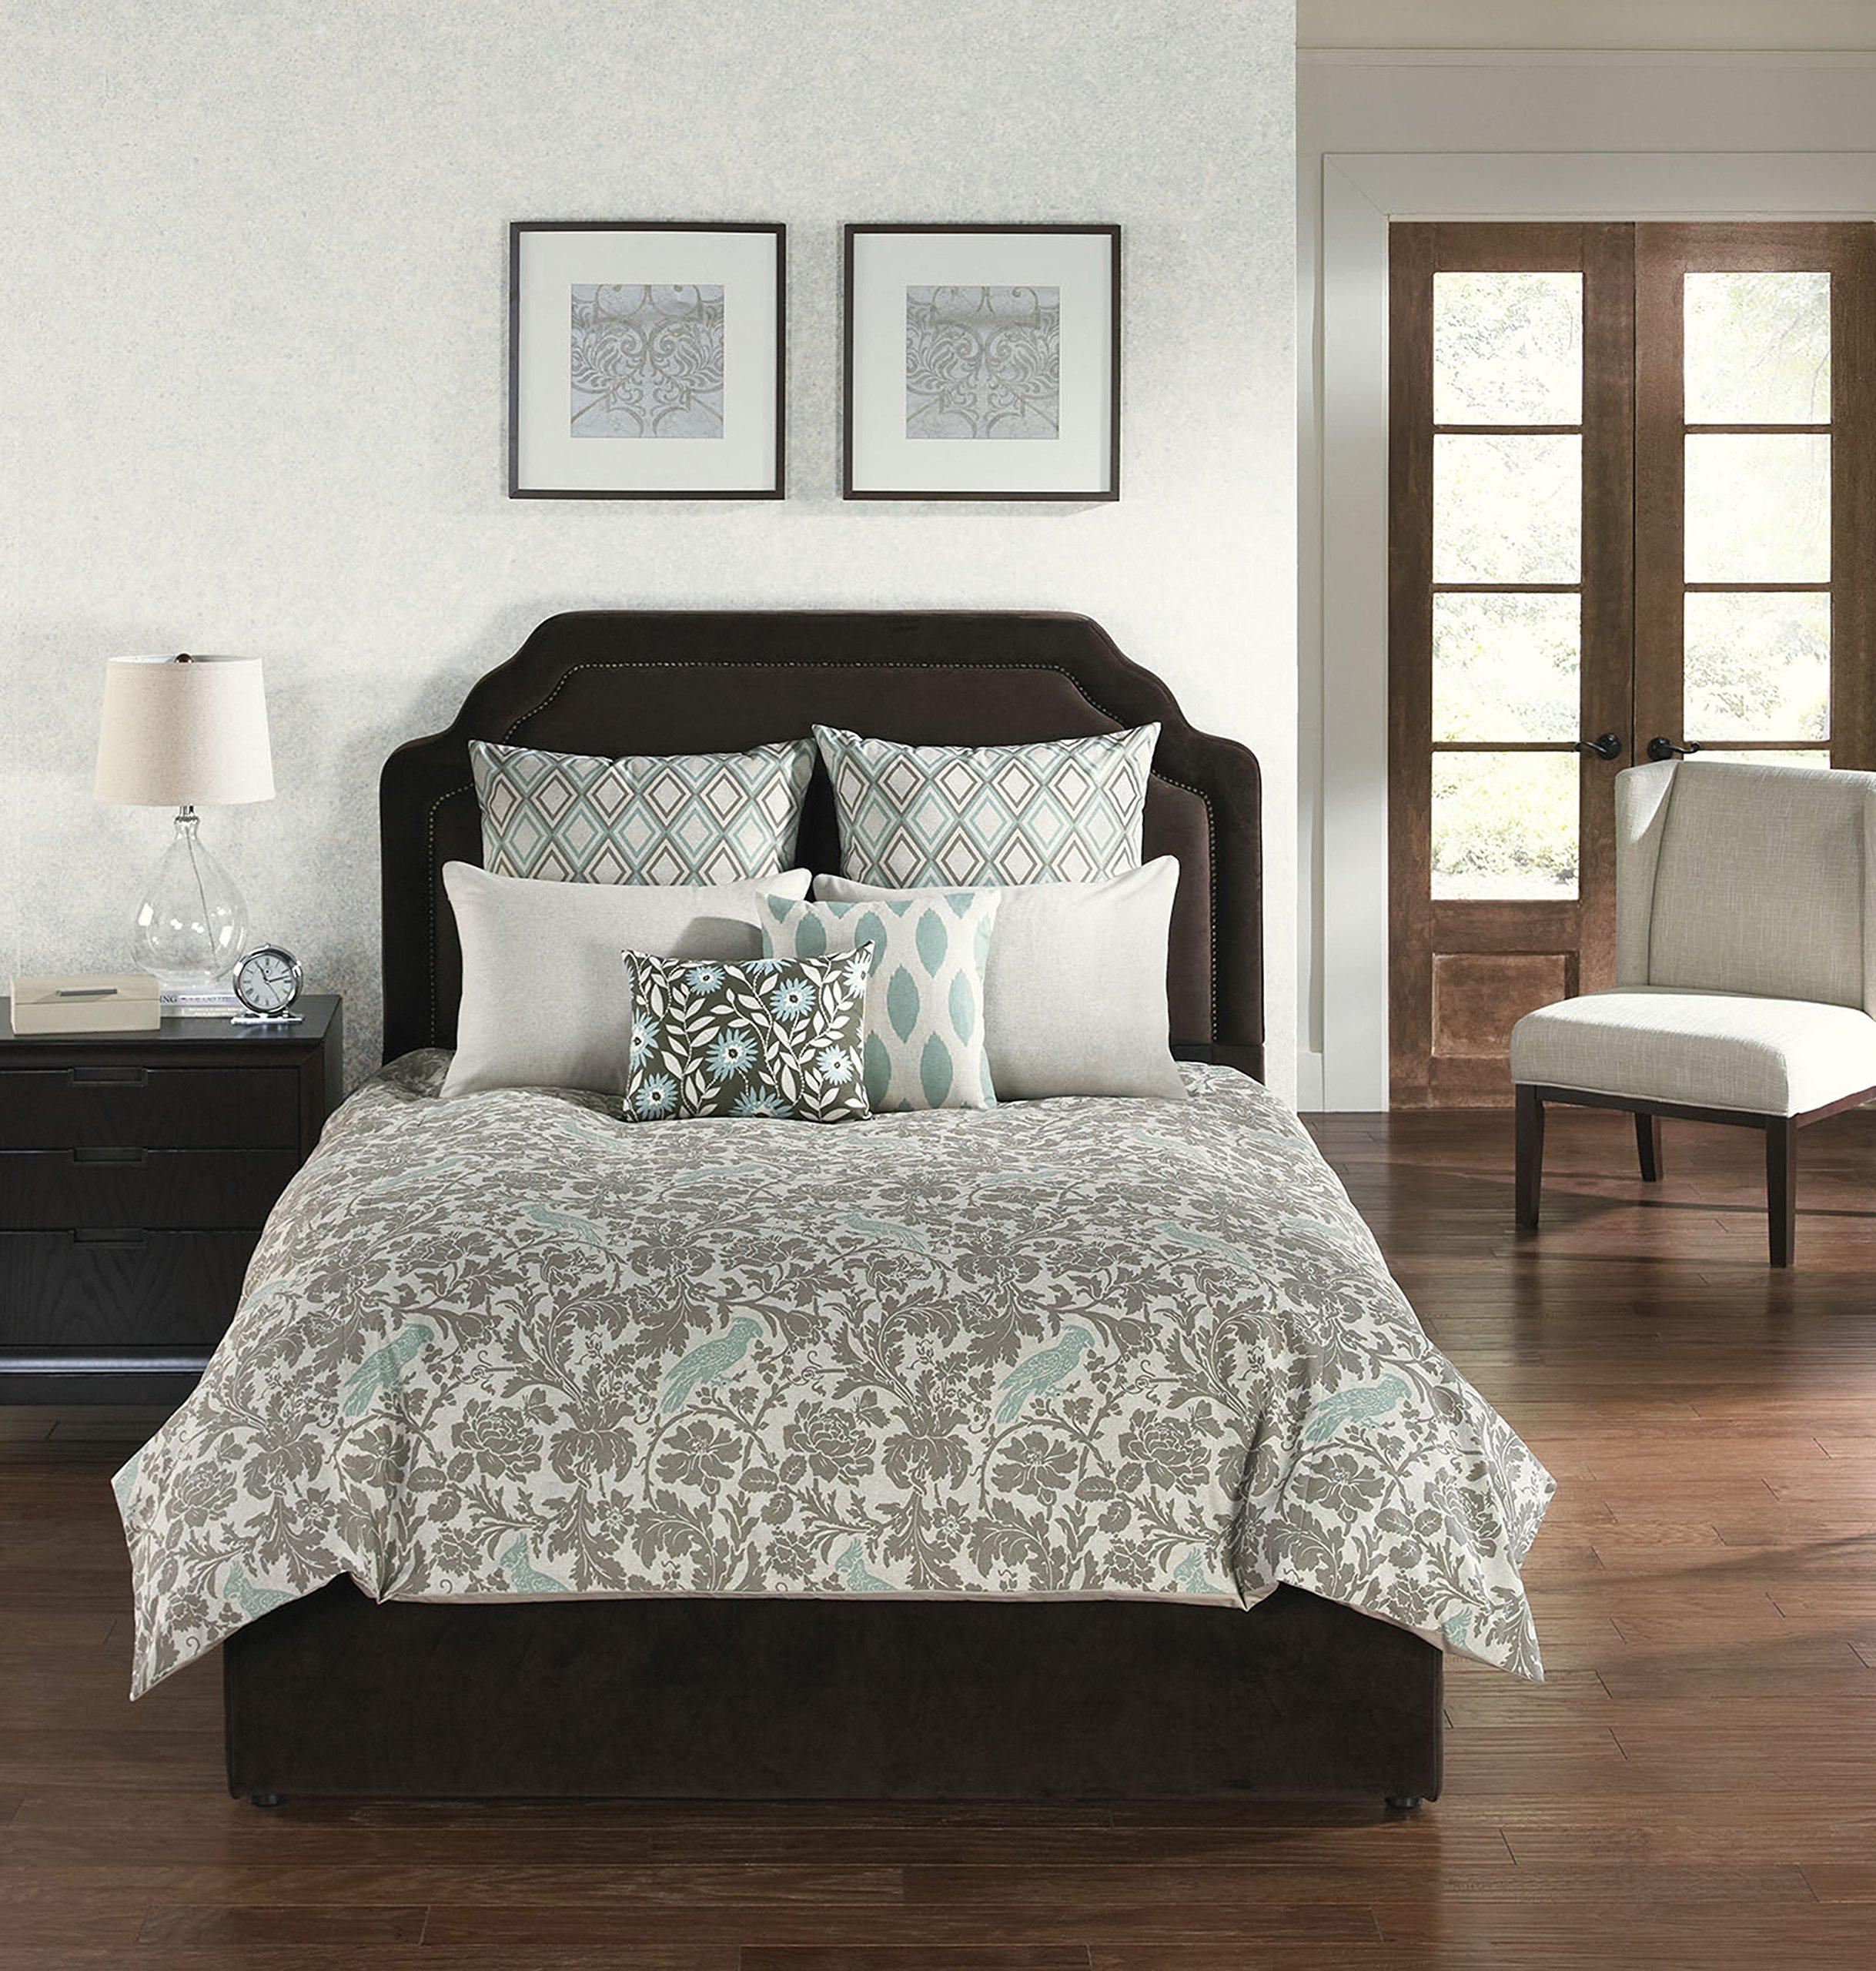 angelo:HOME USA 67218 6-Piece Square Camden Park Comforter with Filler Set, Queen, Blue/Gray